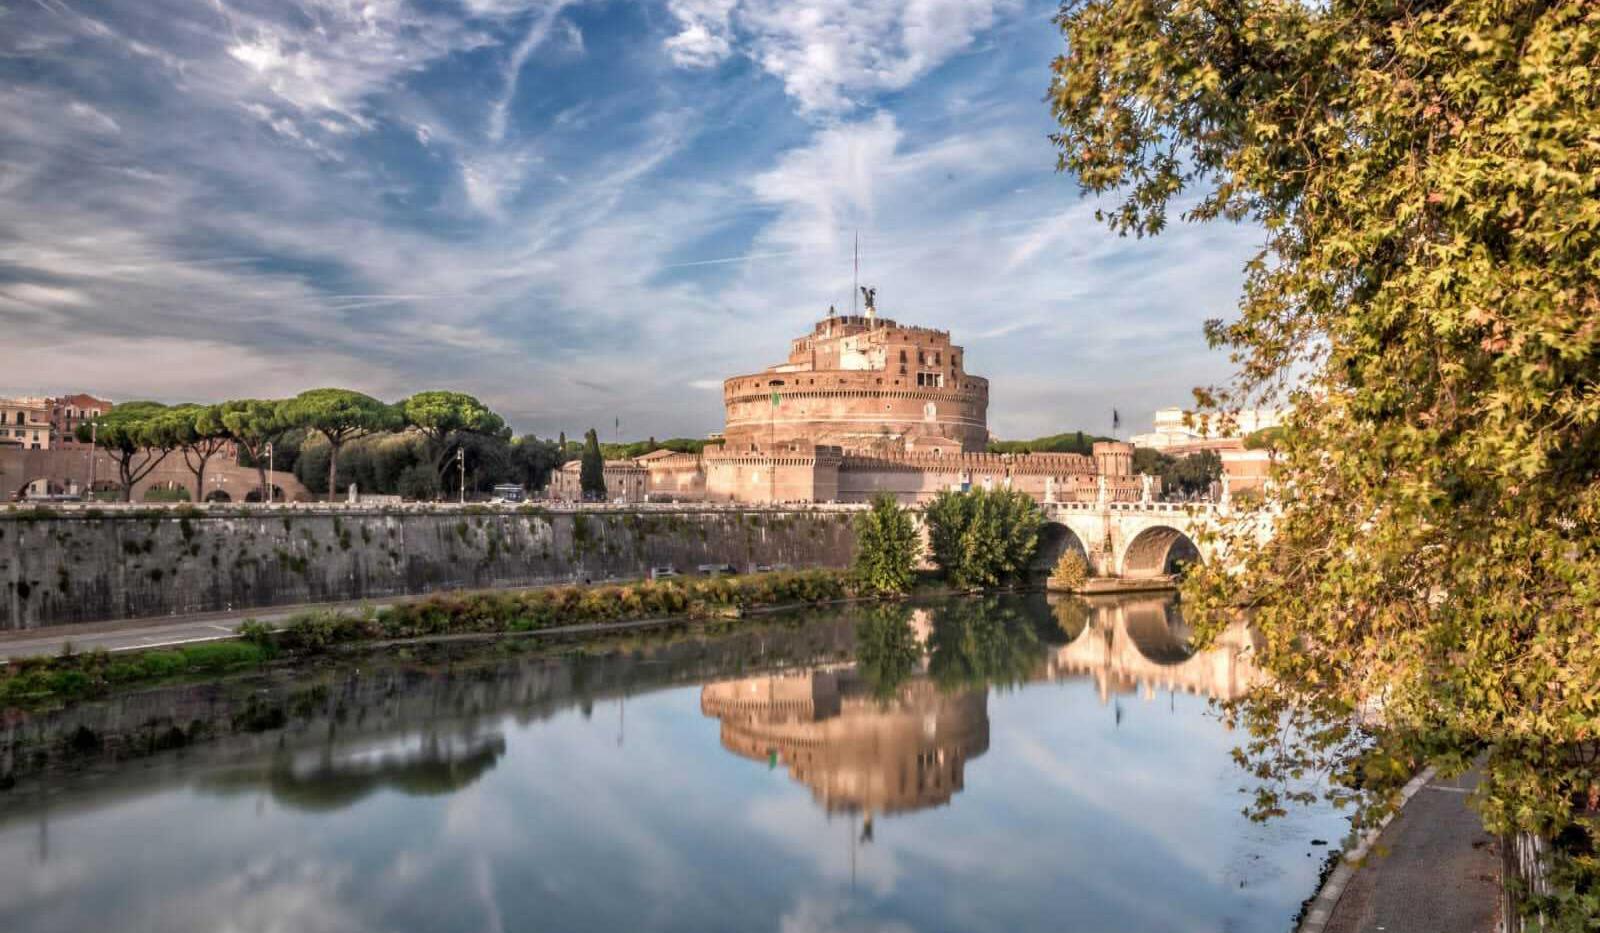 Scene from Rome